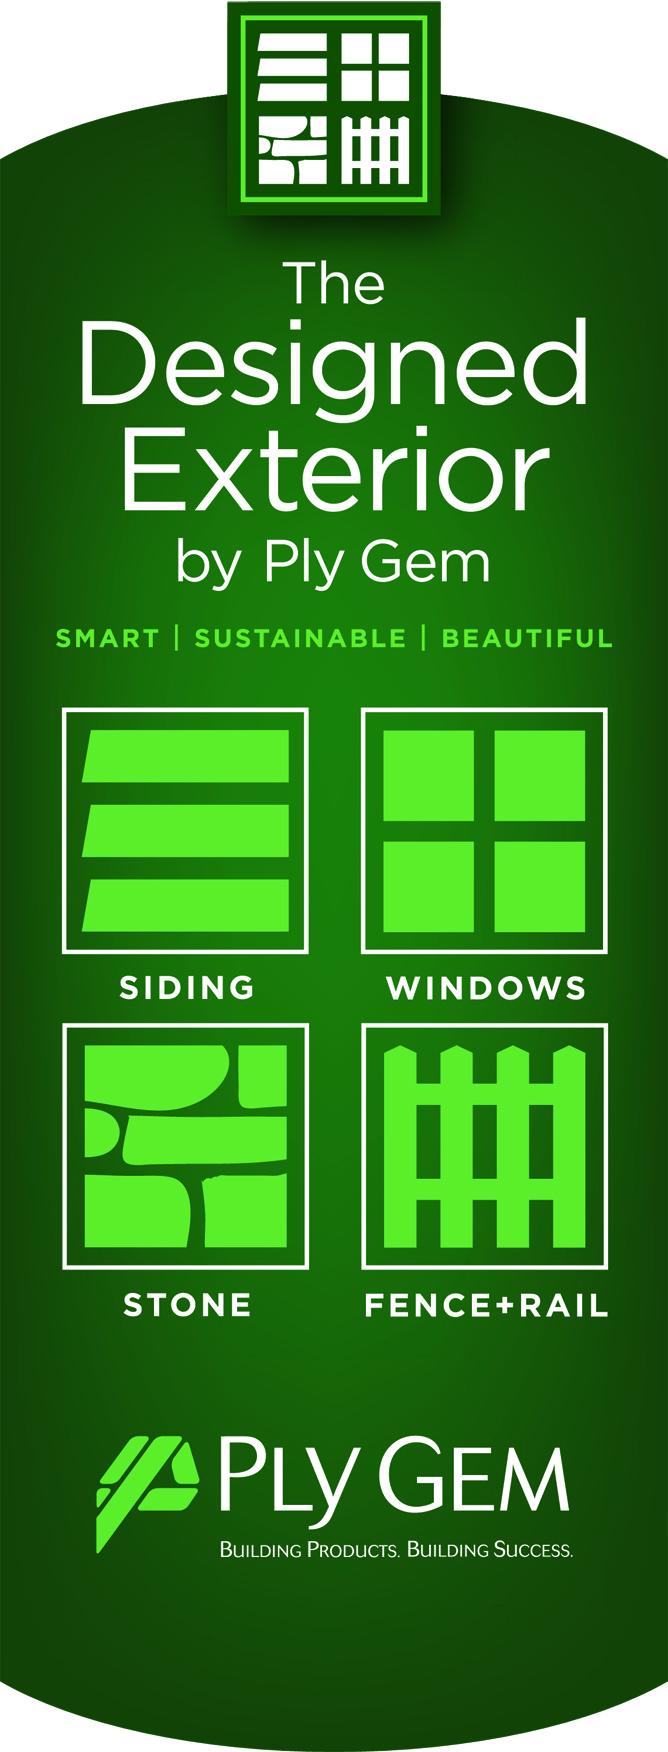 Ply Gem Patio Doors: Schumacher Homes Announces Winner Of The Great Green